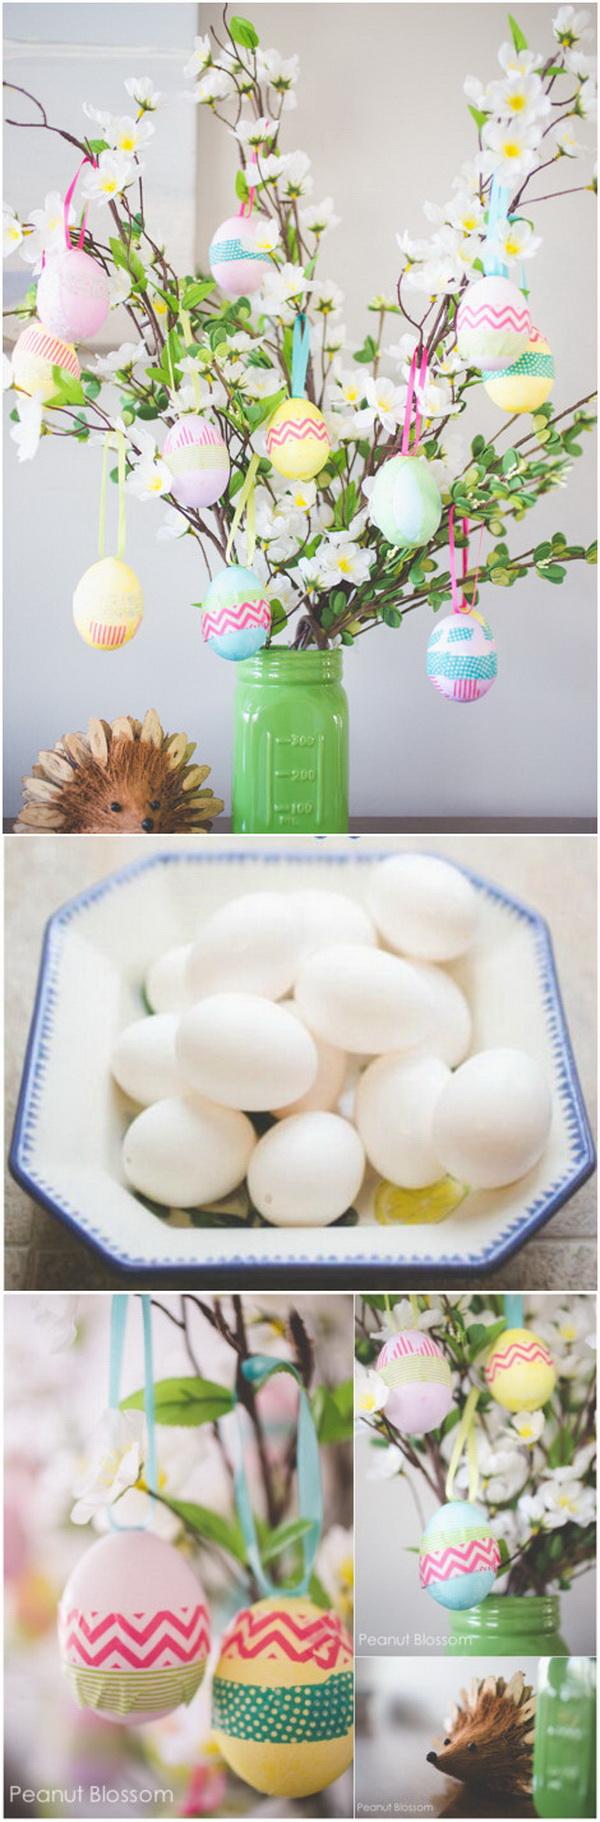 DIY Easter Decoration Ideas: Easter Egg Tree.